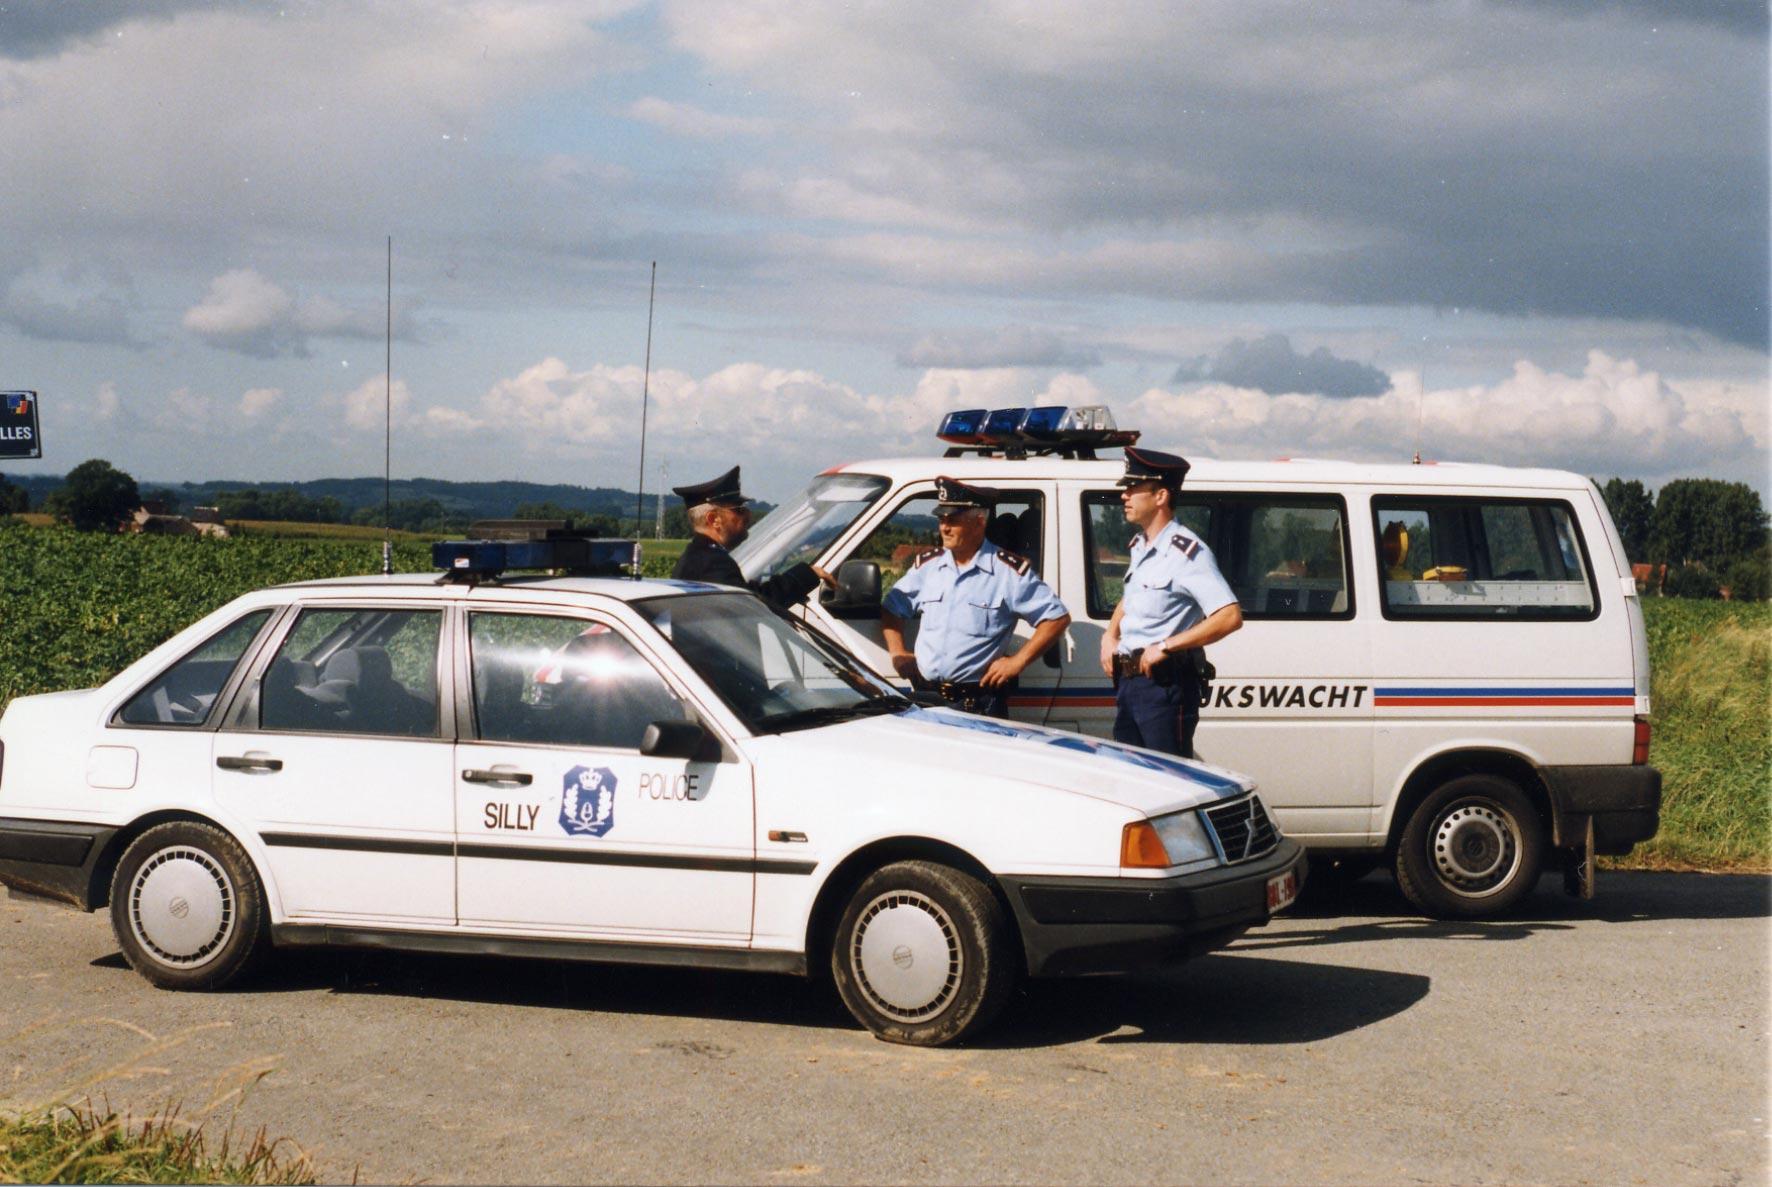 photos de voitures de police - page 233